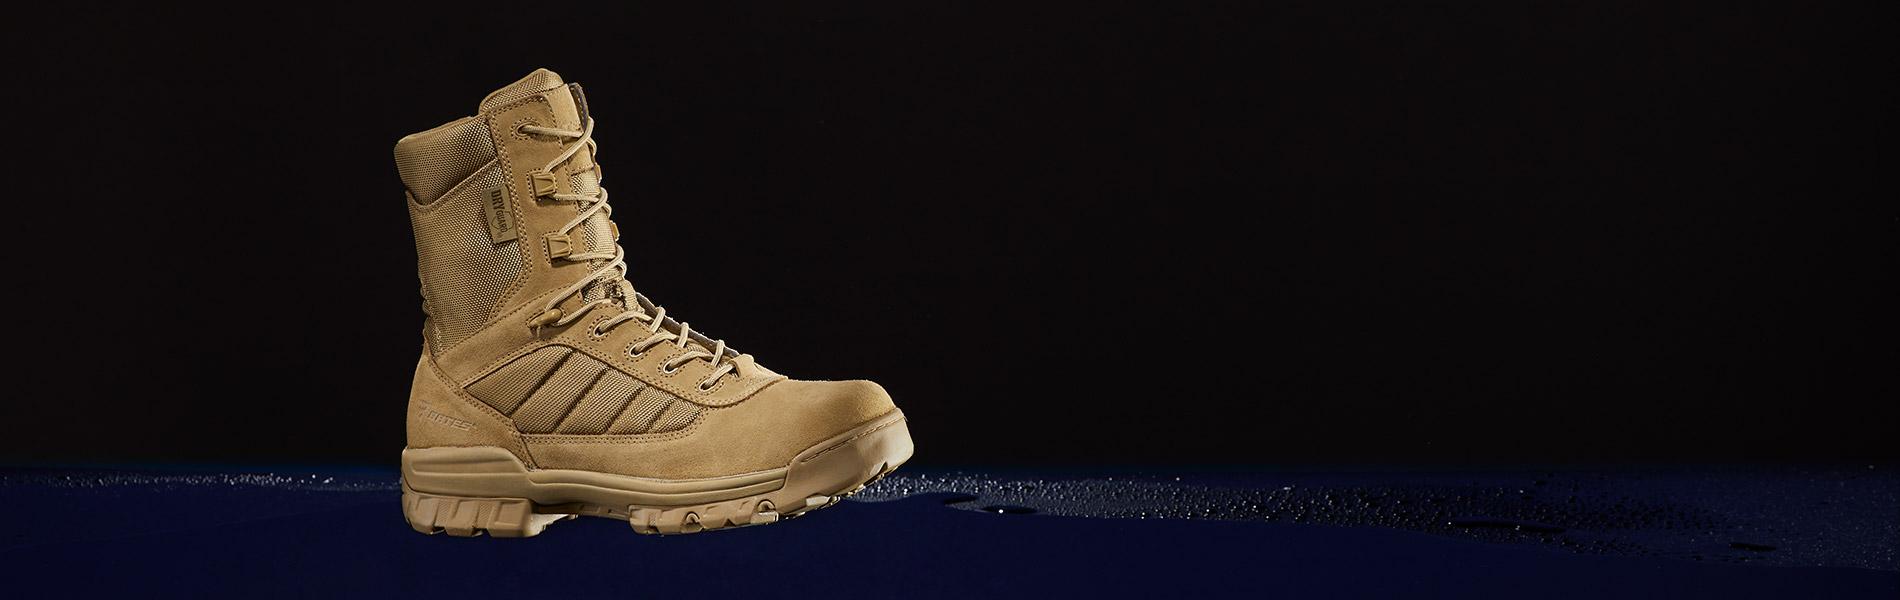 Men 8 Quot Tactical Sport Dryguard Side Zip Boots Bates